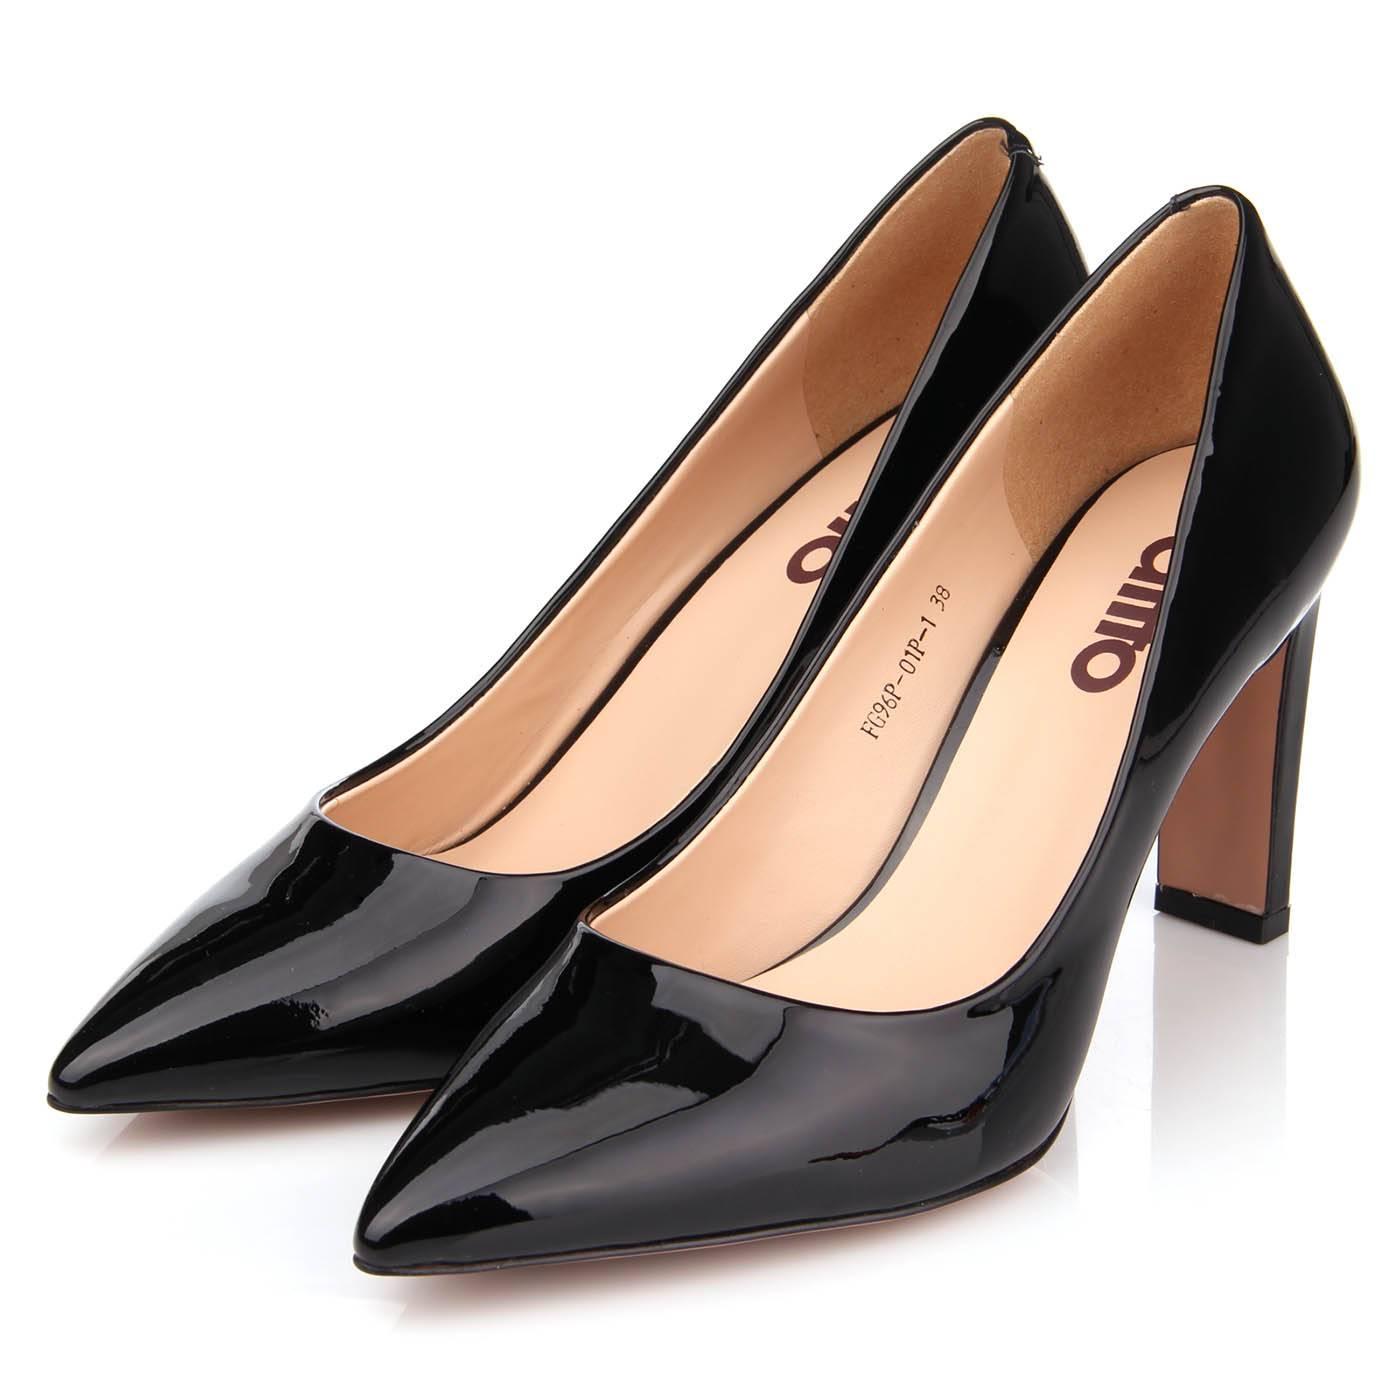 Туфлі жіночі ditto 6449 Чорний купить по выгодной цене в интернет ... bd22044d5ae49